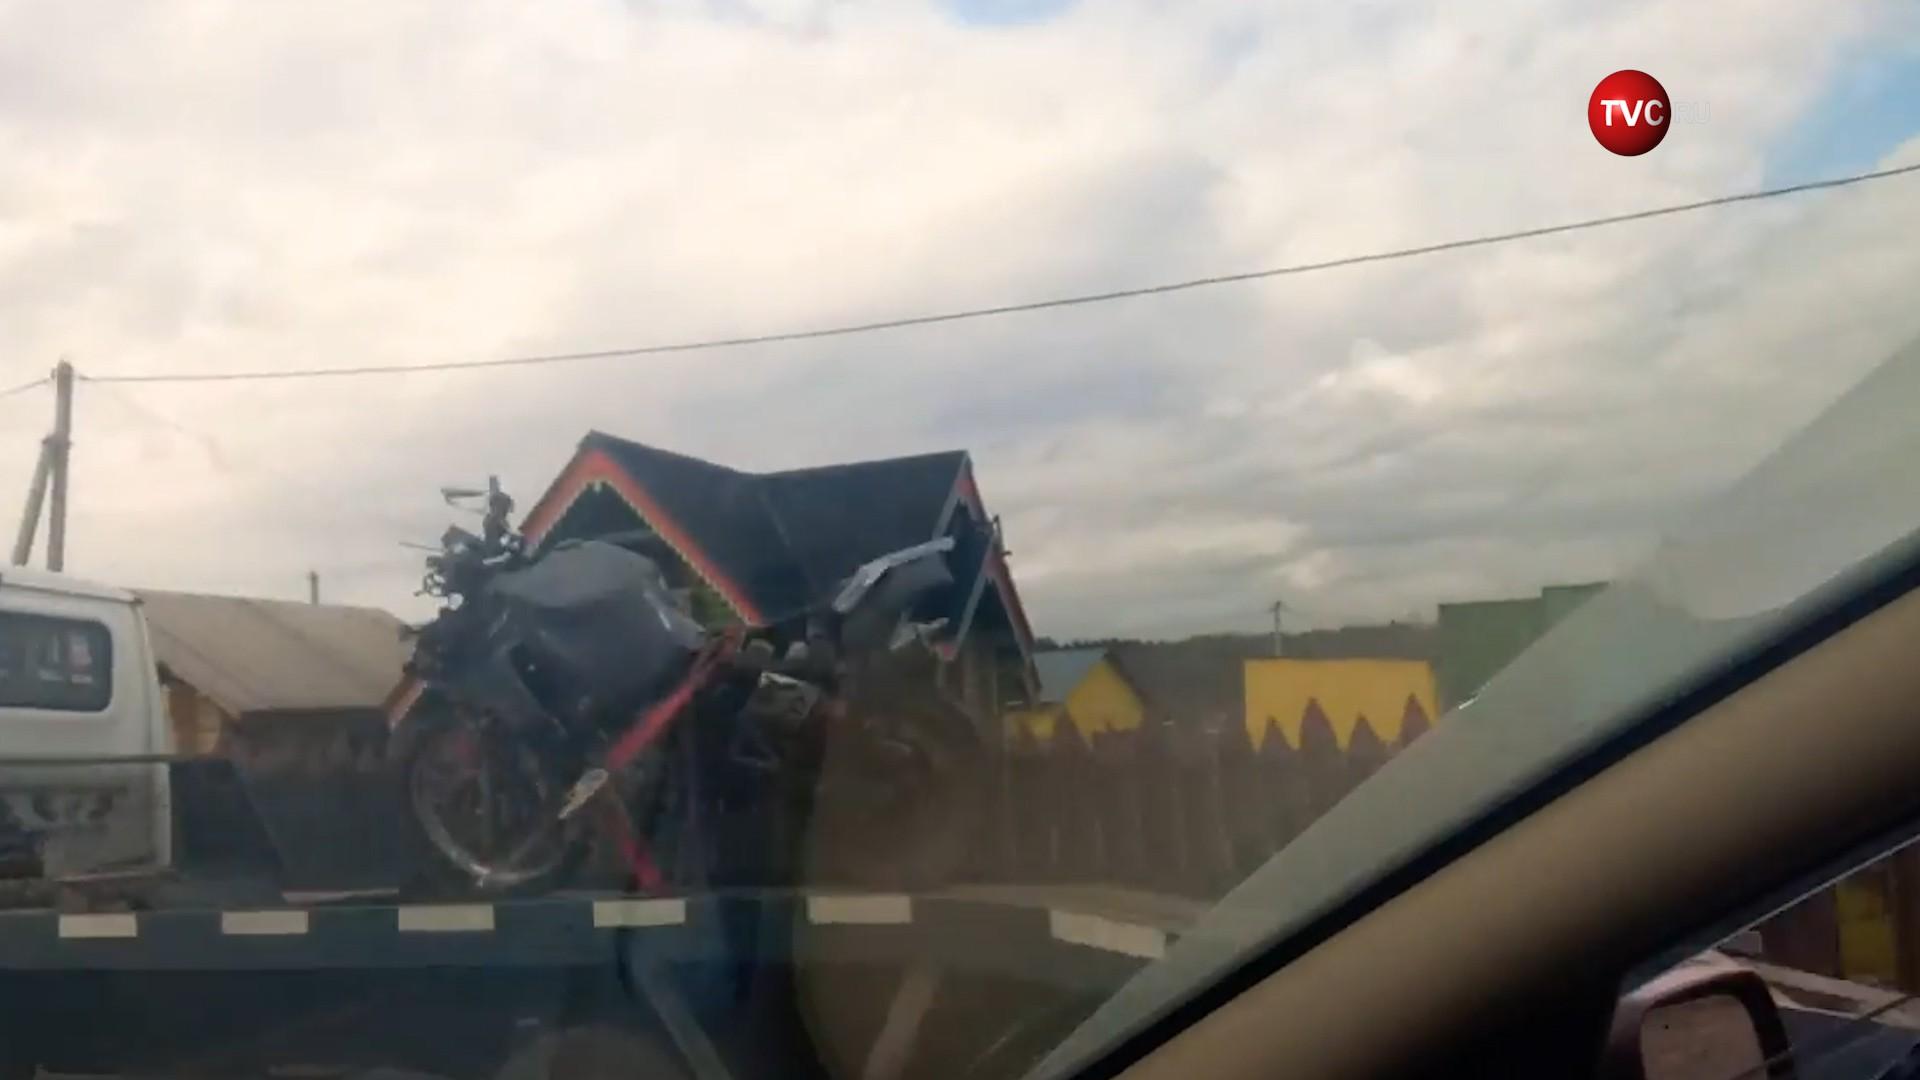 Последствия ДТП с участием мотоцикла